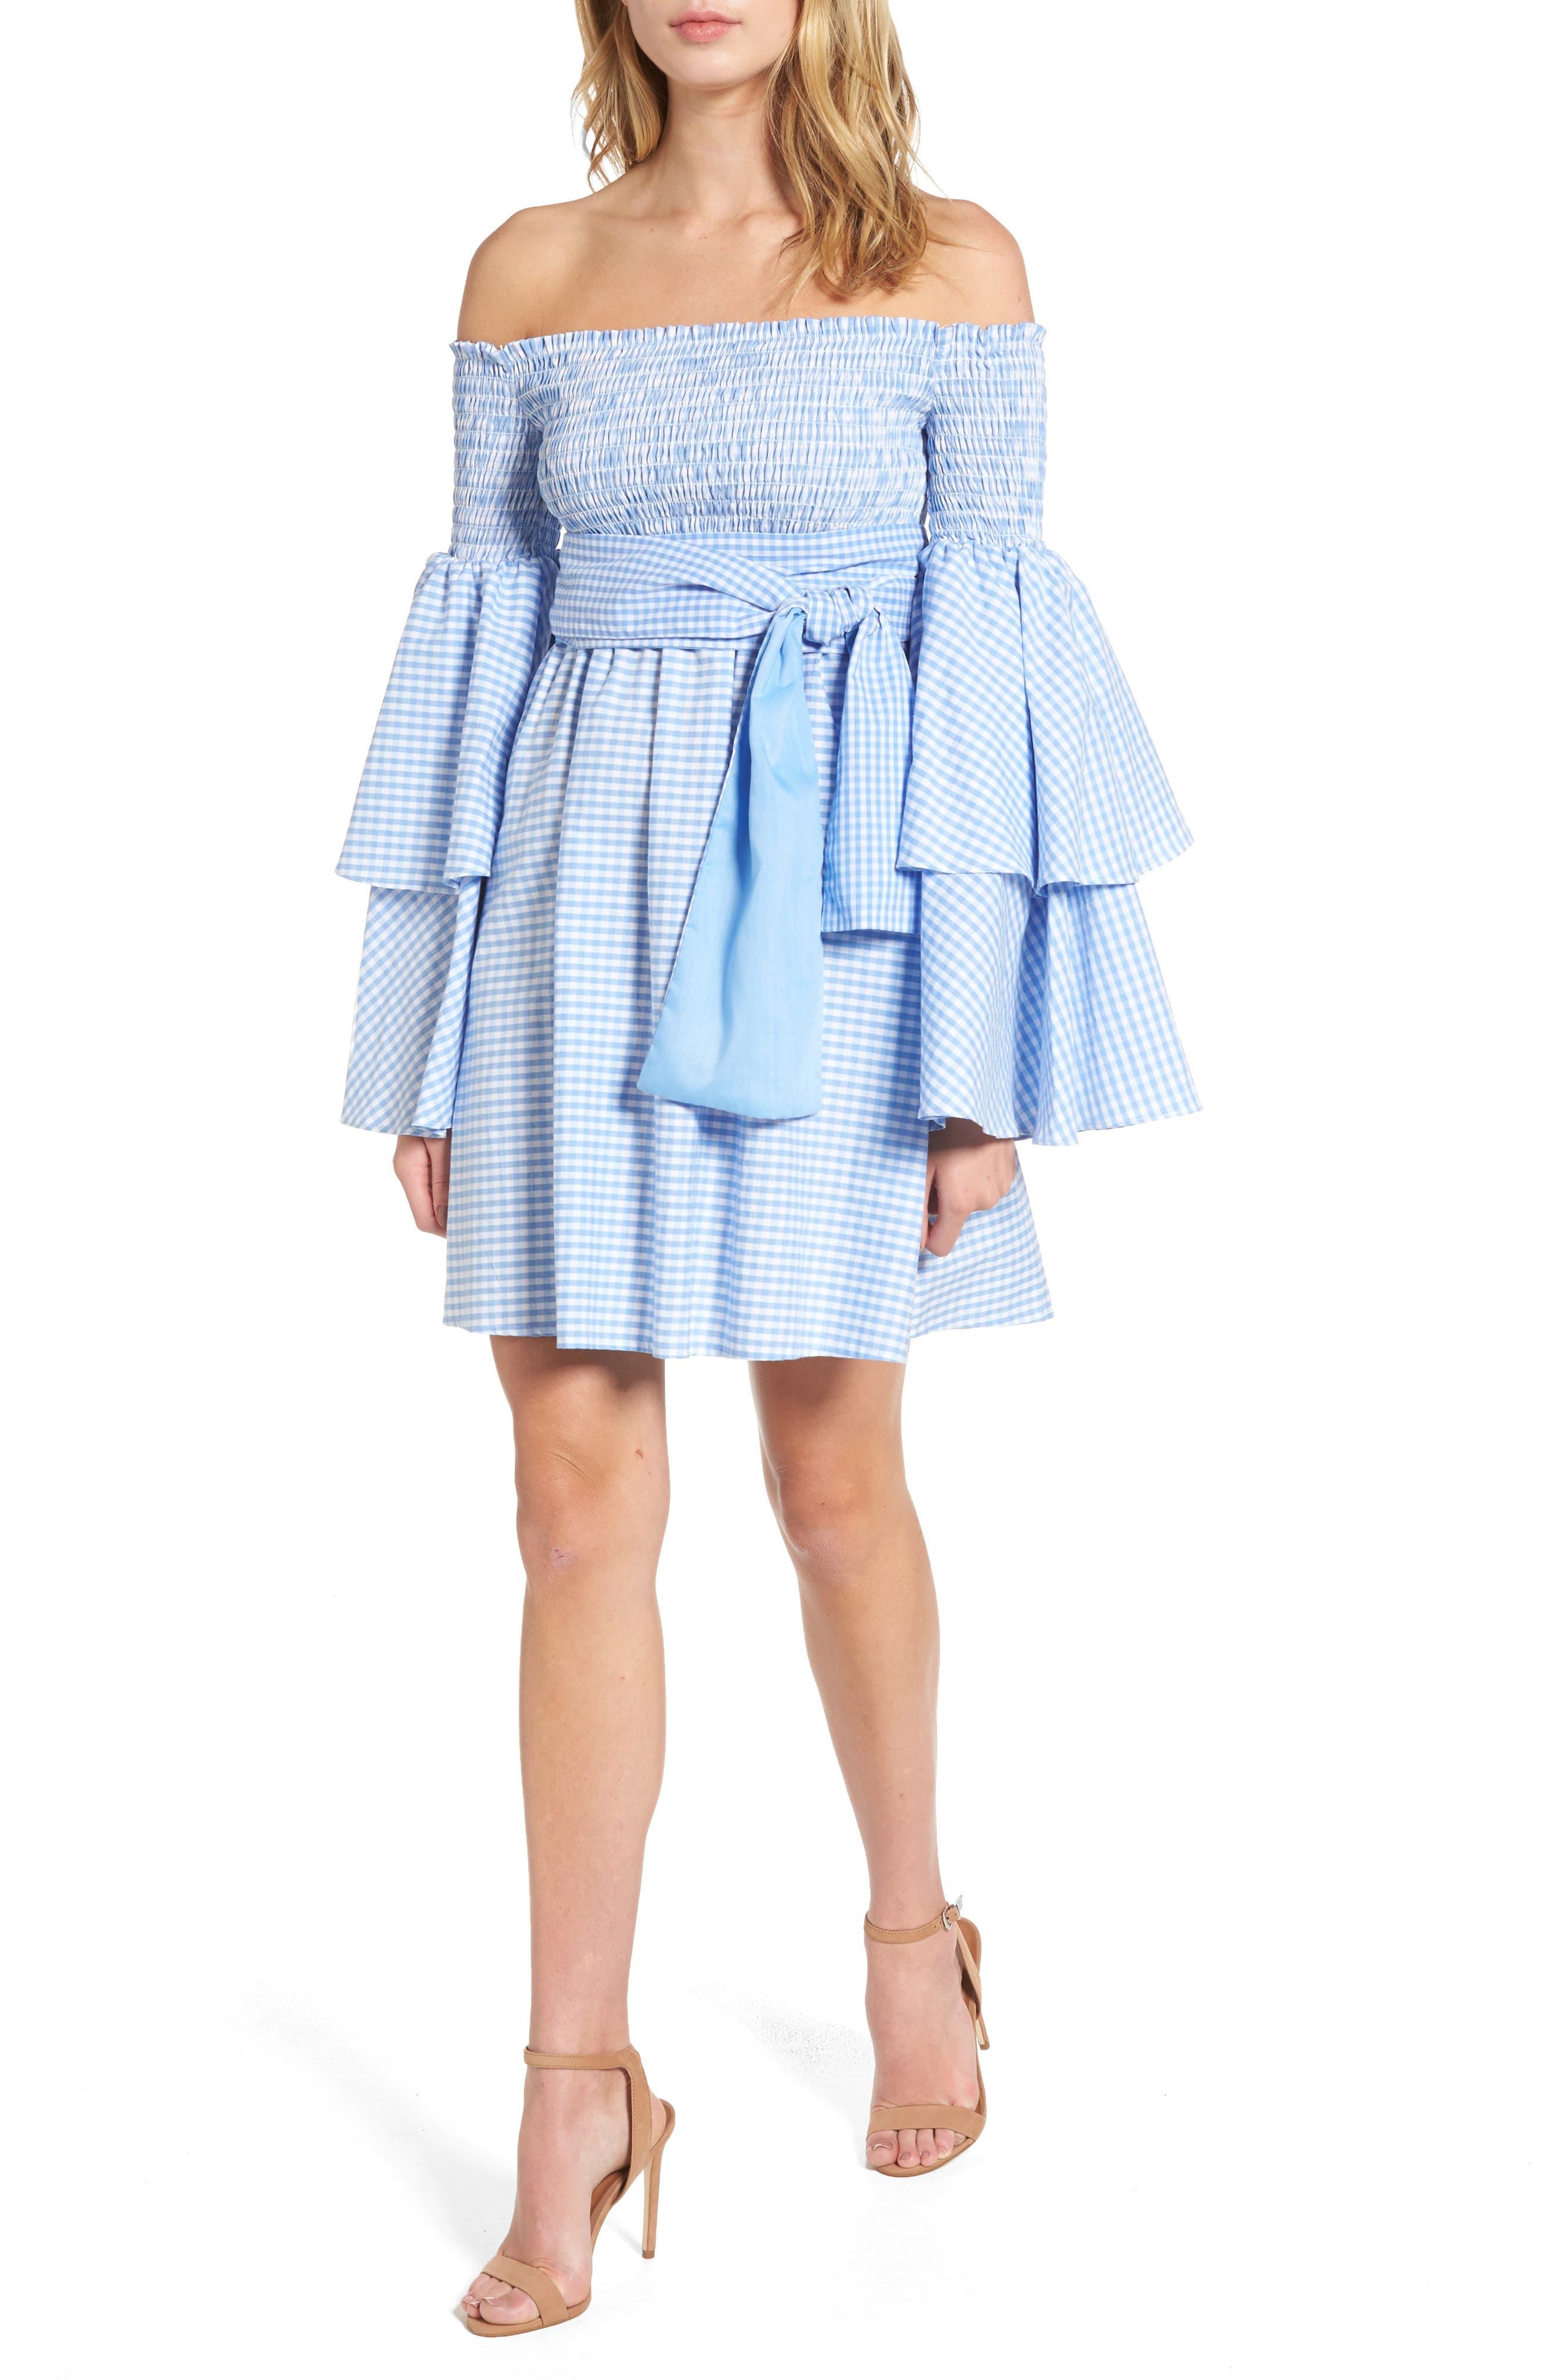 Disco Fever Off the Shoulder Dress,                         Main,                         color, 401